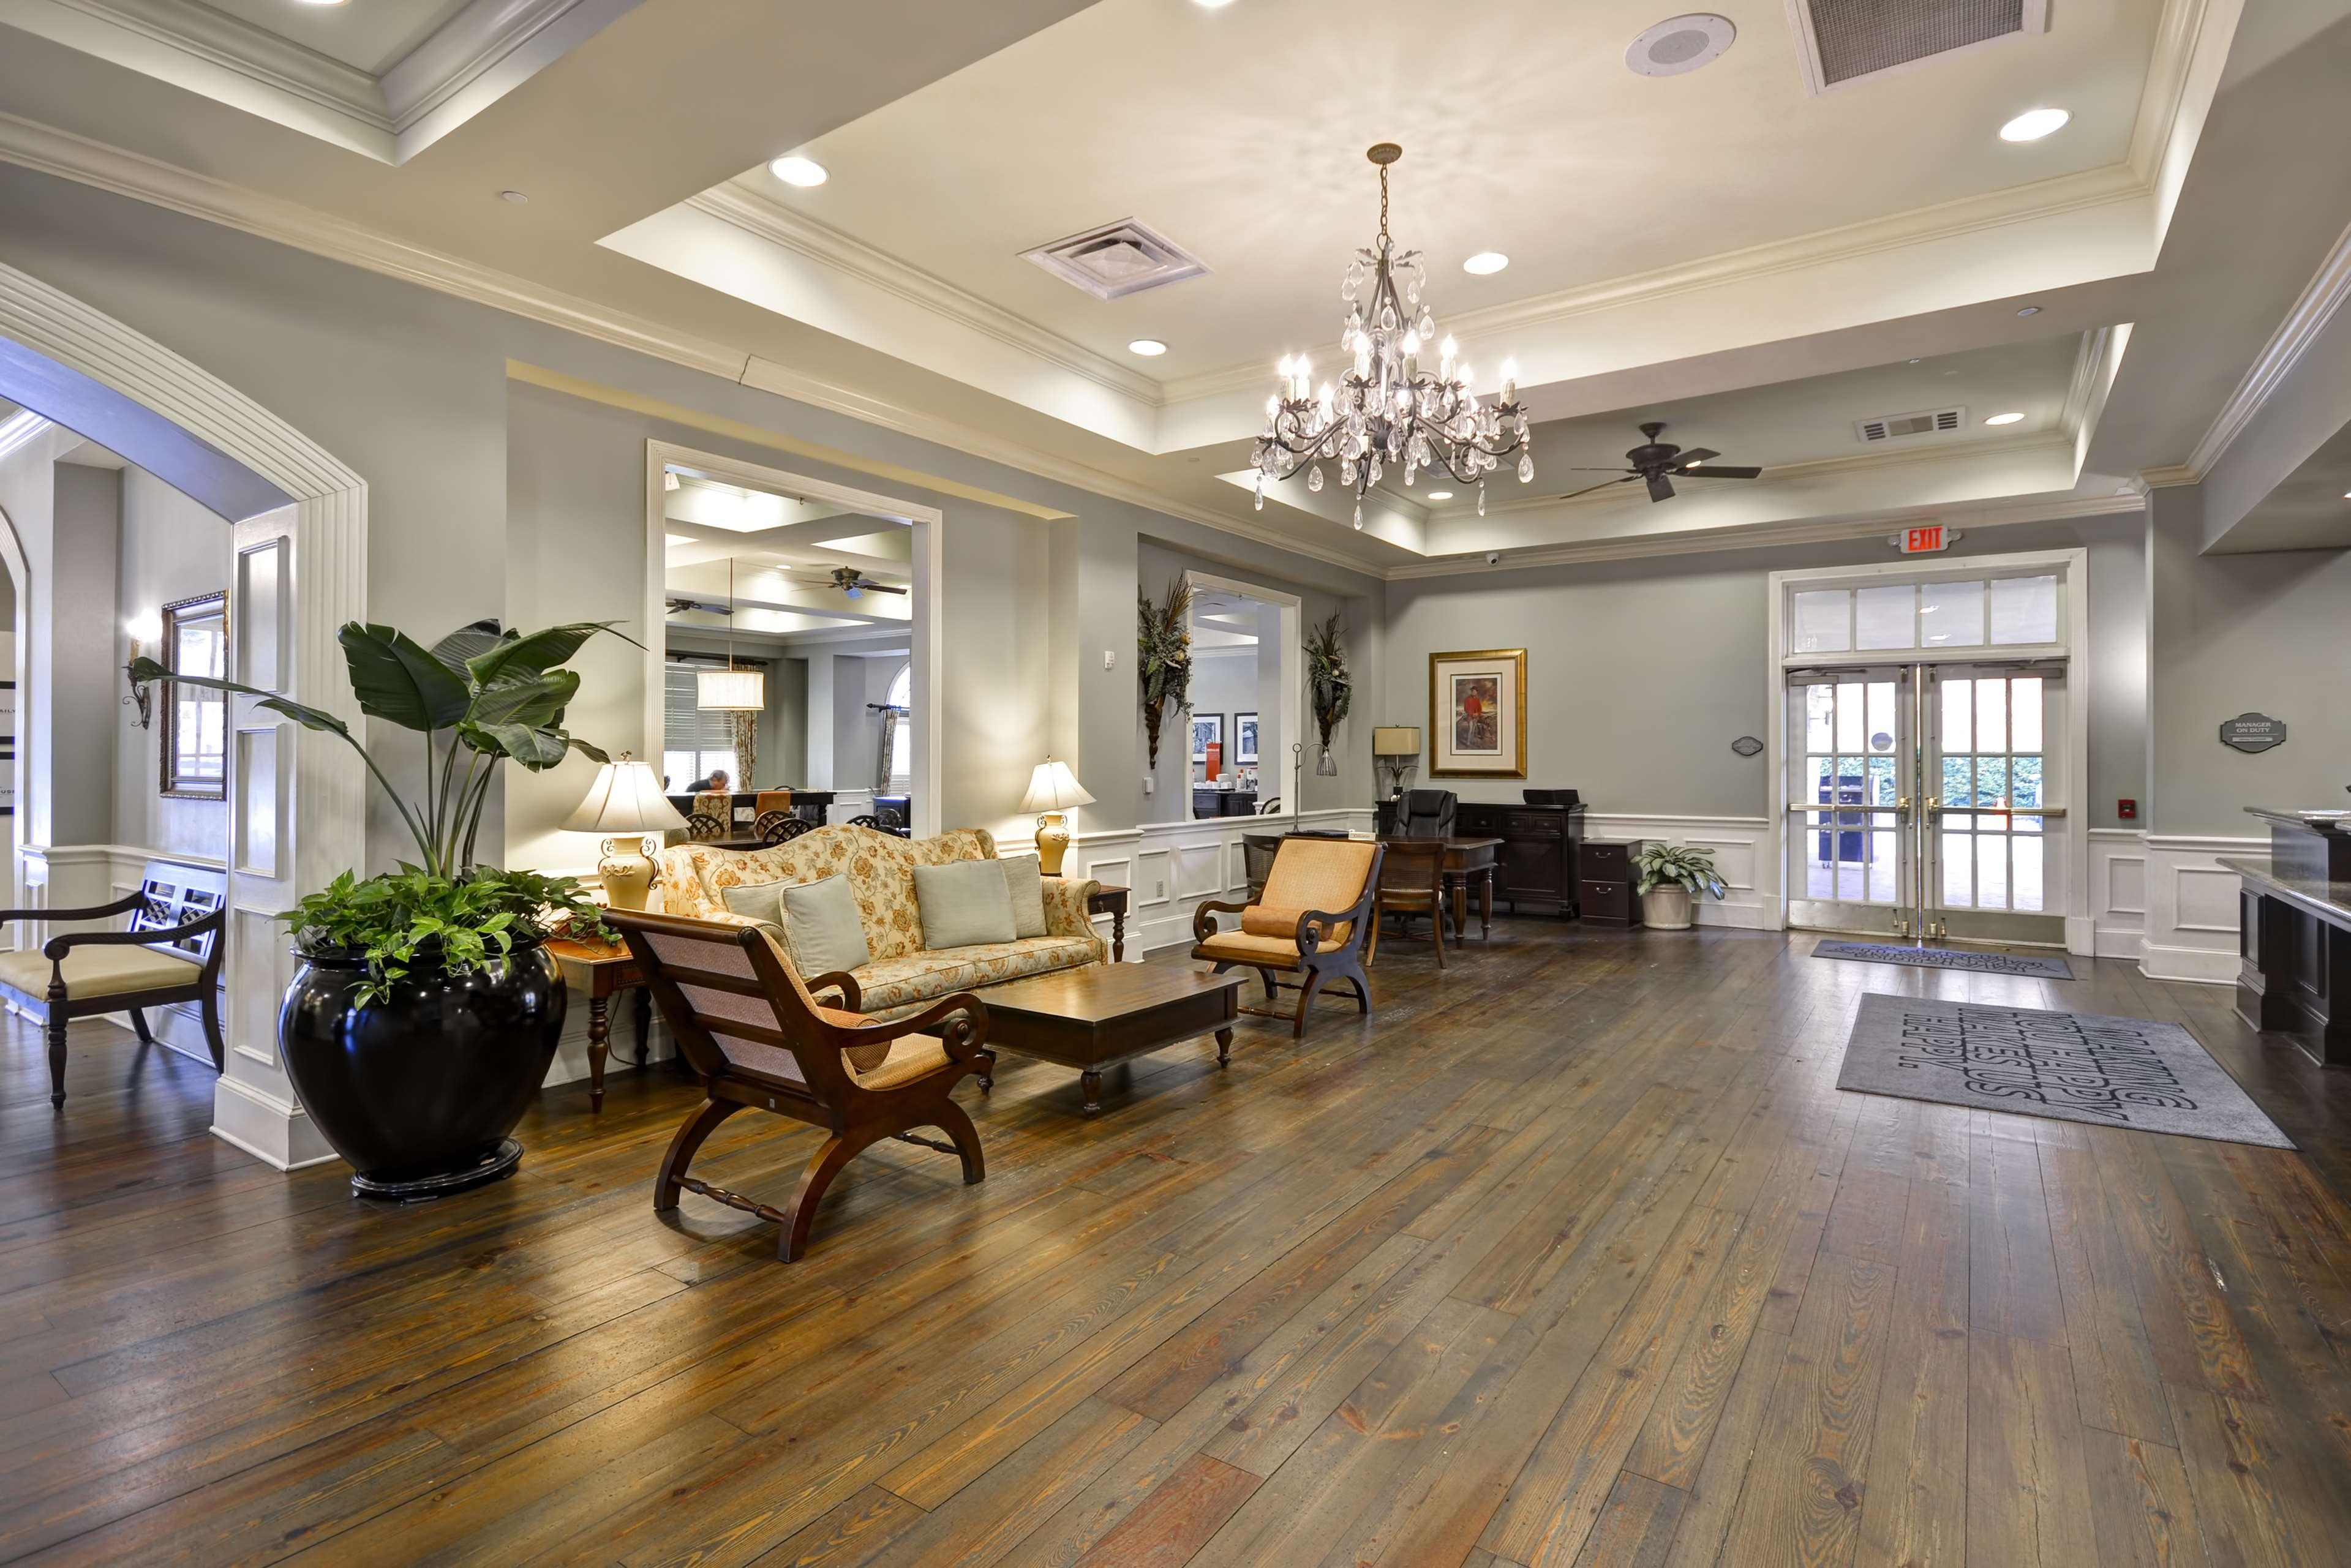 Hampton Inn & Suites Savannah Historic District image 0